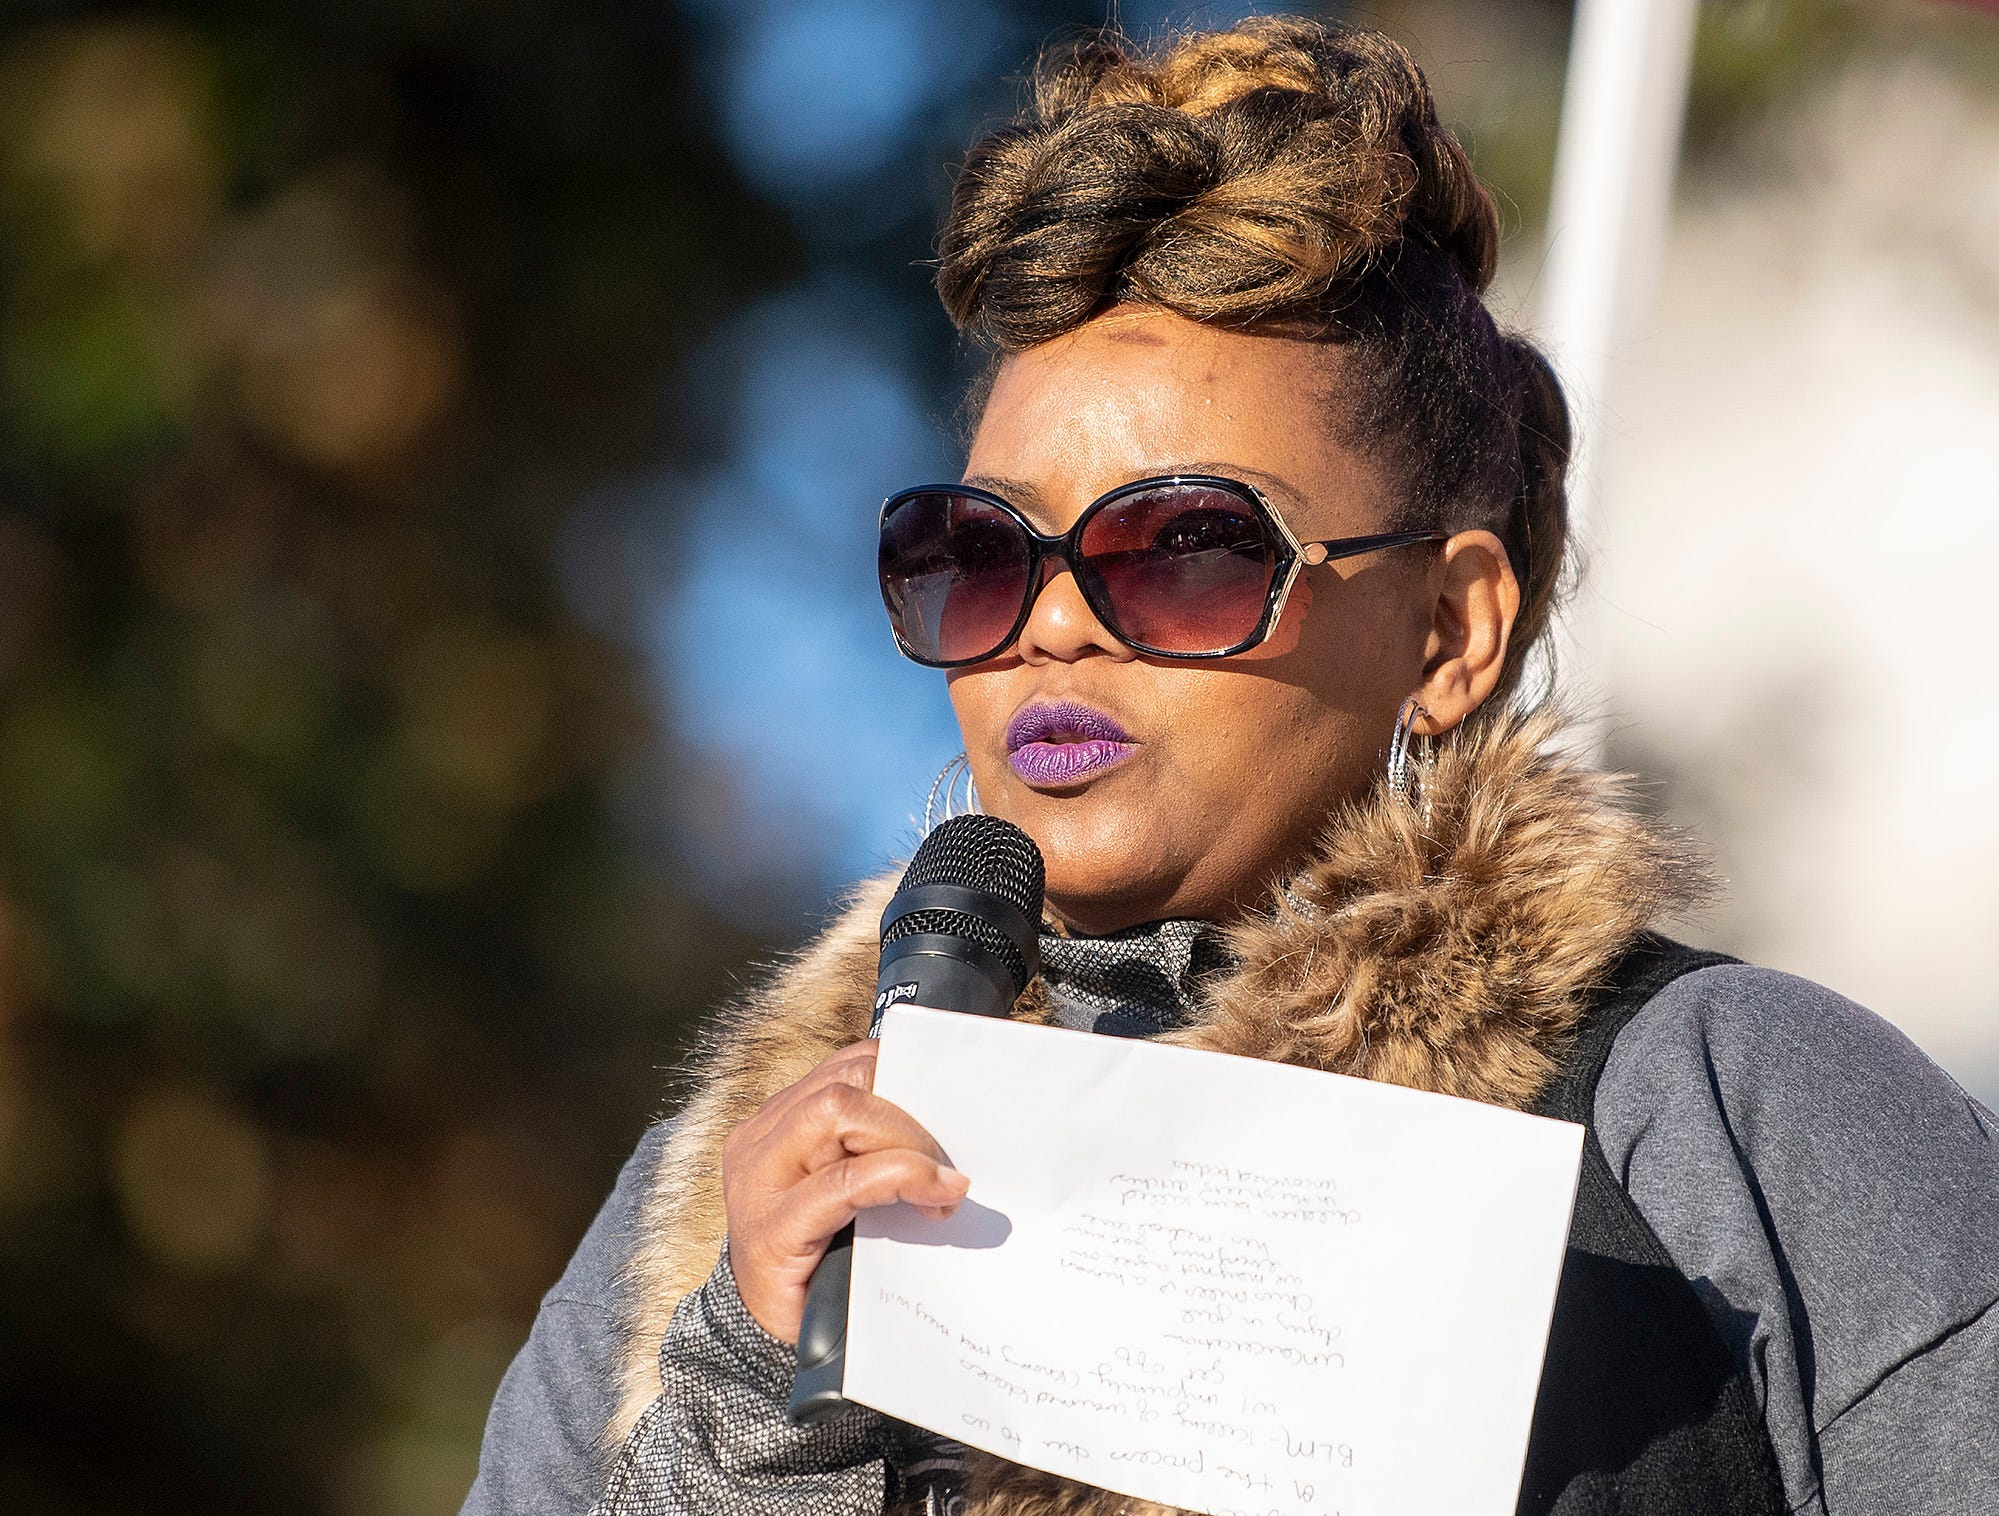 Karen Jones speaks during the Montgomery Women's March in downtown Montgomery, Ala., on Saturday January 26, 2019.